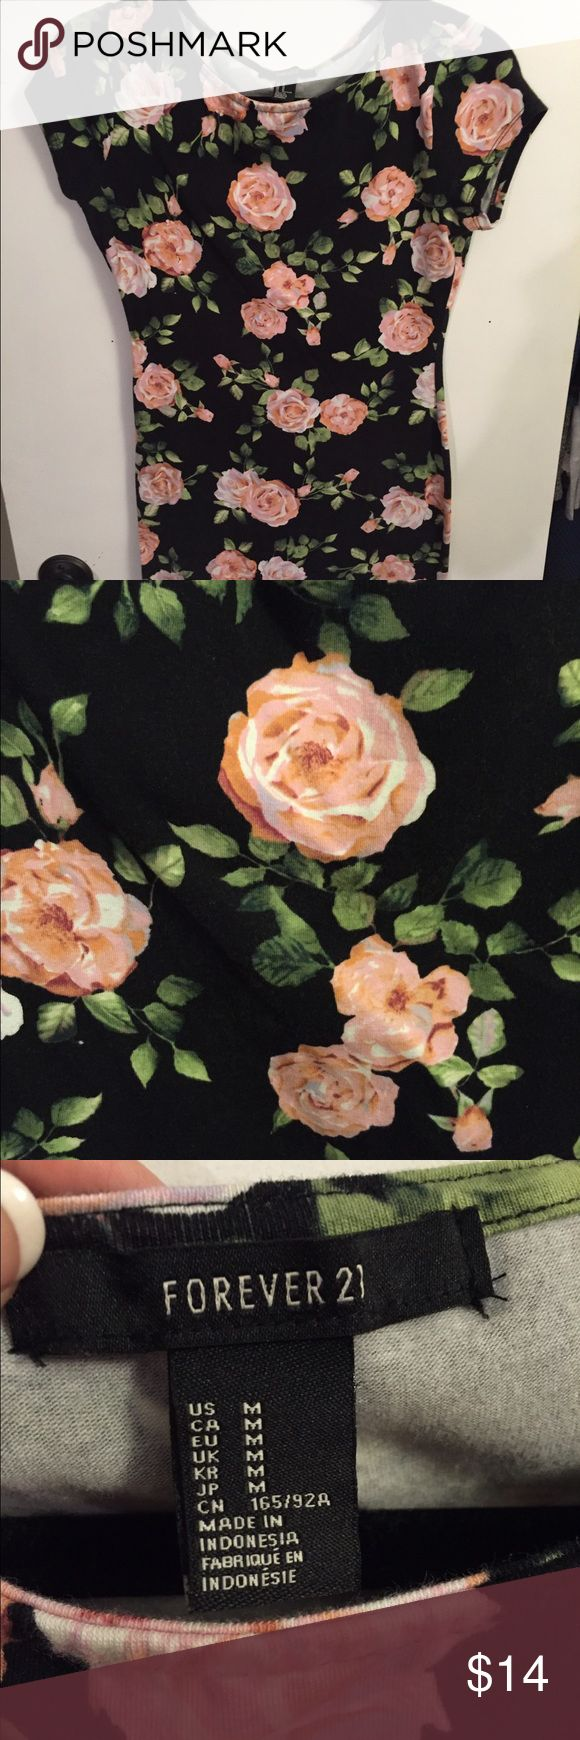 Pretty rose pattern bodycon dress size M Accepting offers!!! Pretty rose pattern bodycon dress size M Forever 21 Dresses Mini